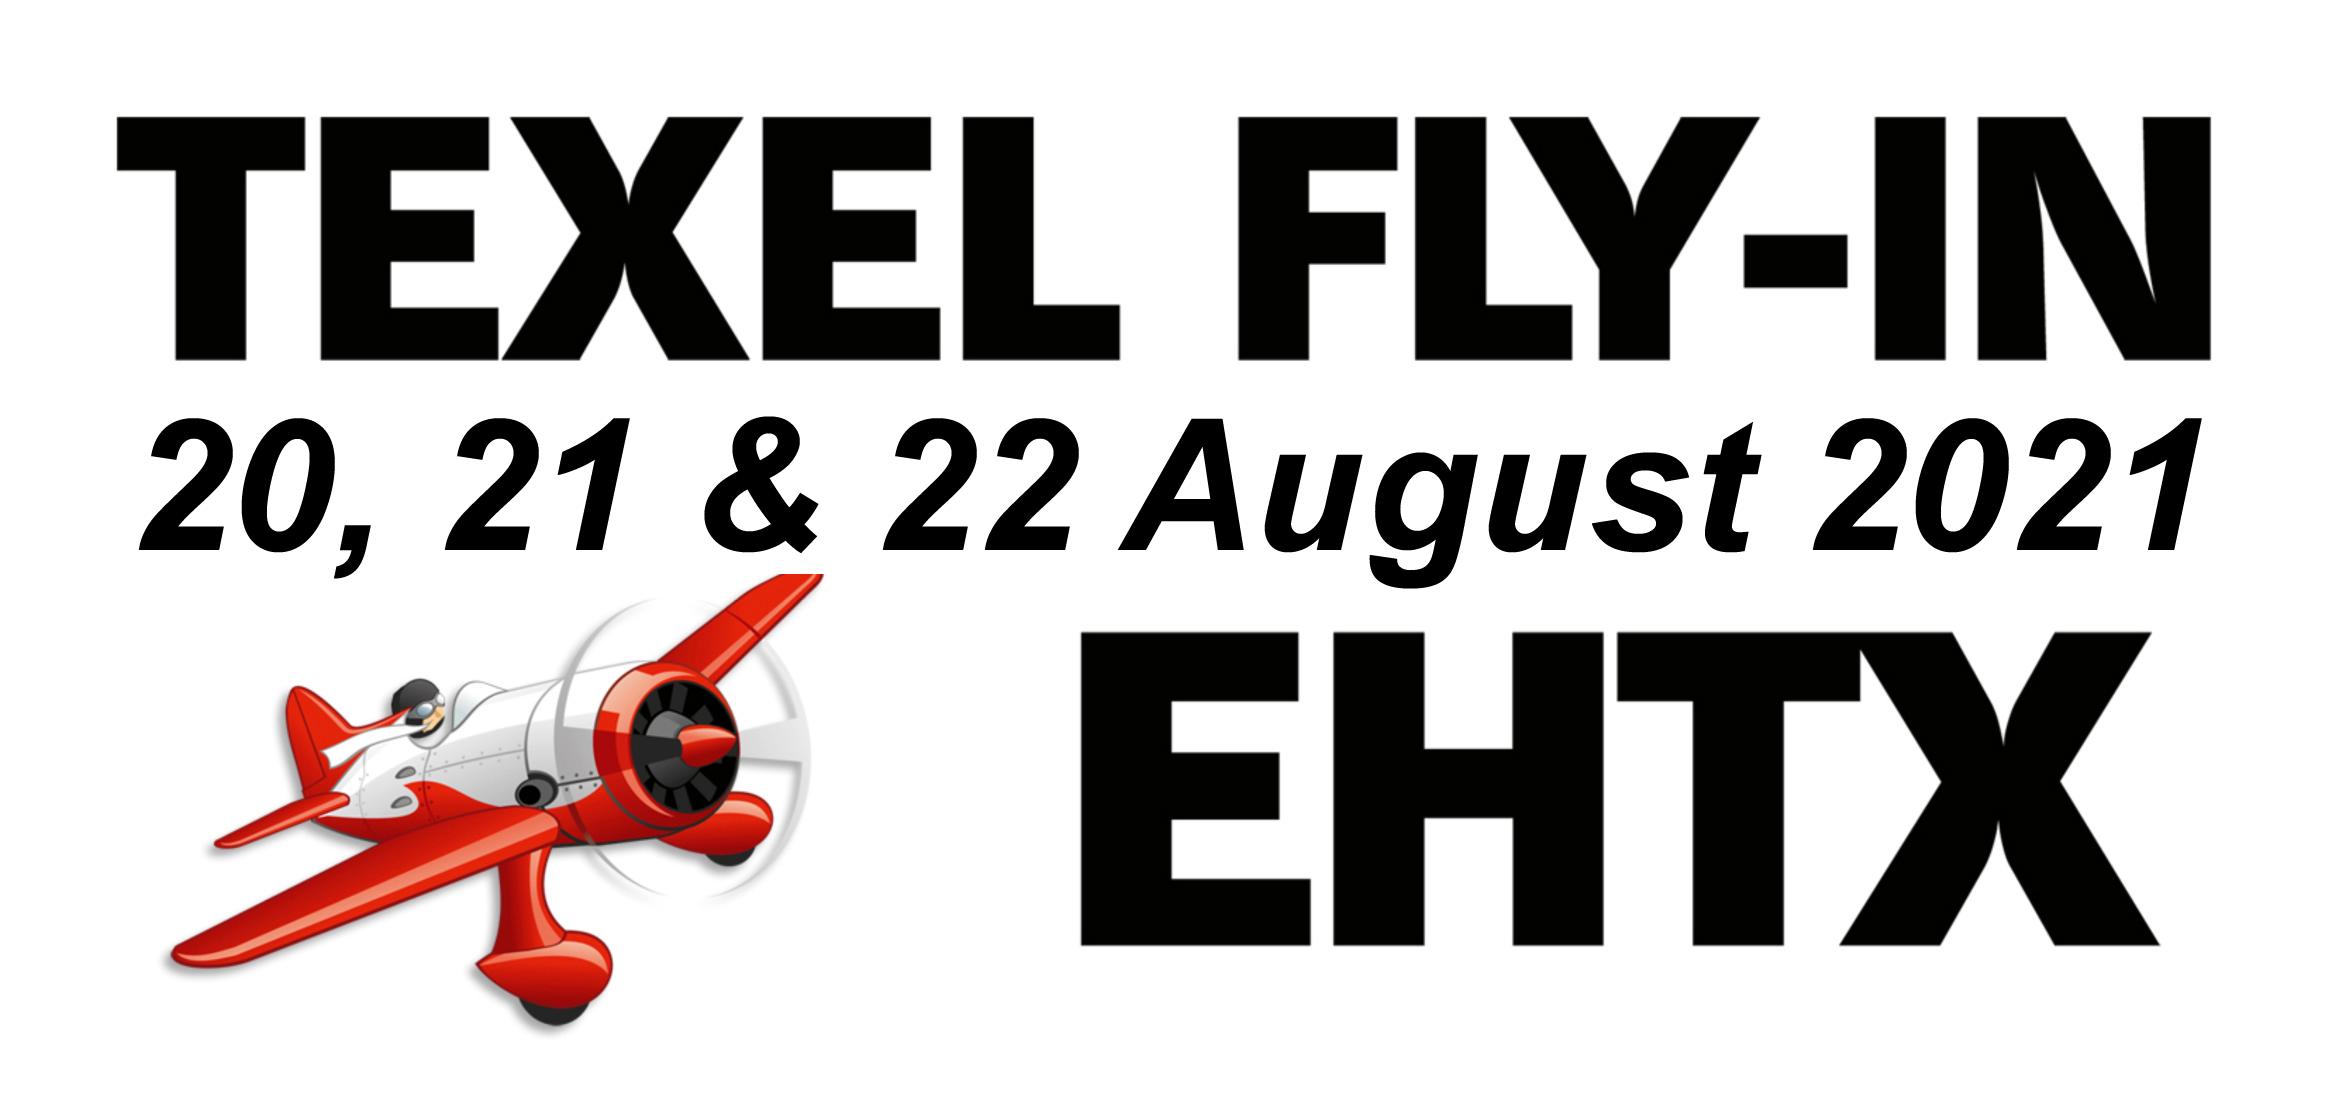 Texelflyin Logo